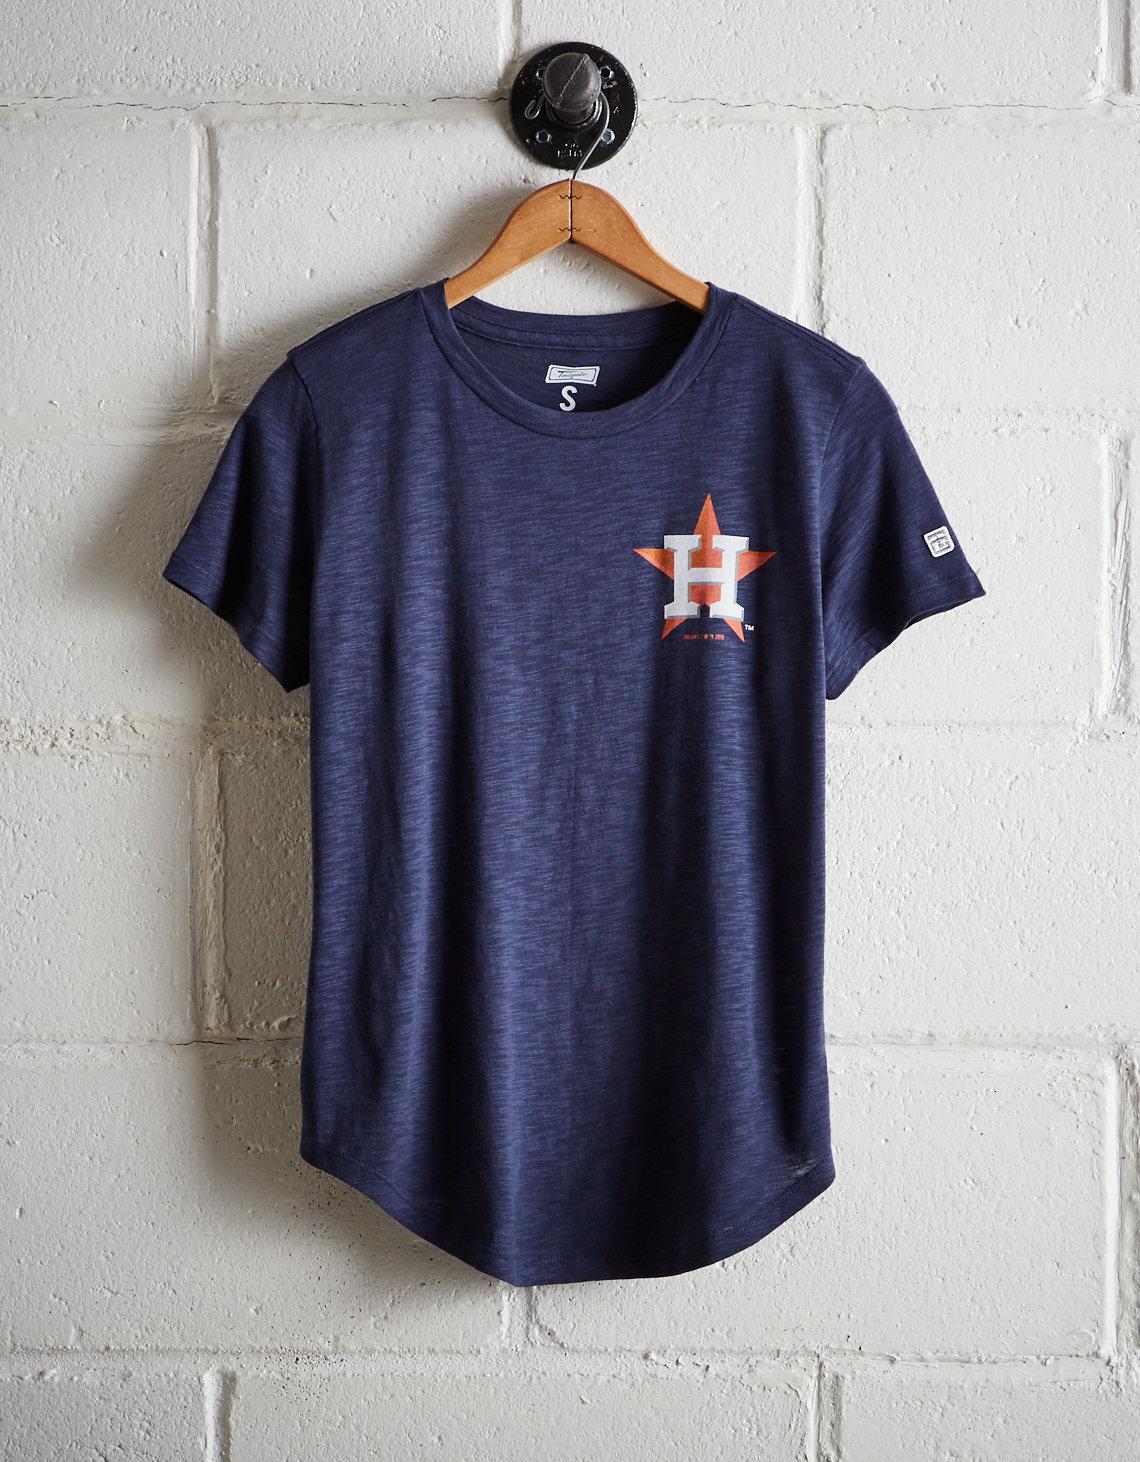 Tailgate Women s Astros Hustle Town T-Shirt. Placeholder image. Product  Image 4d357856c6